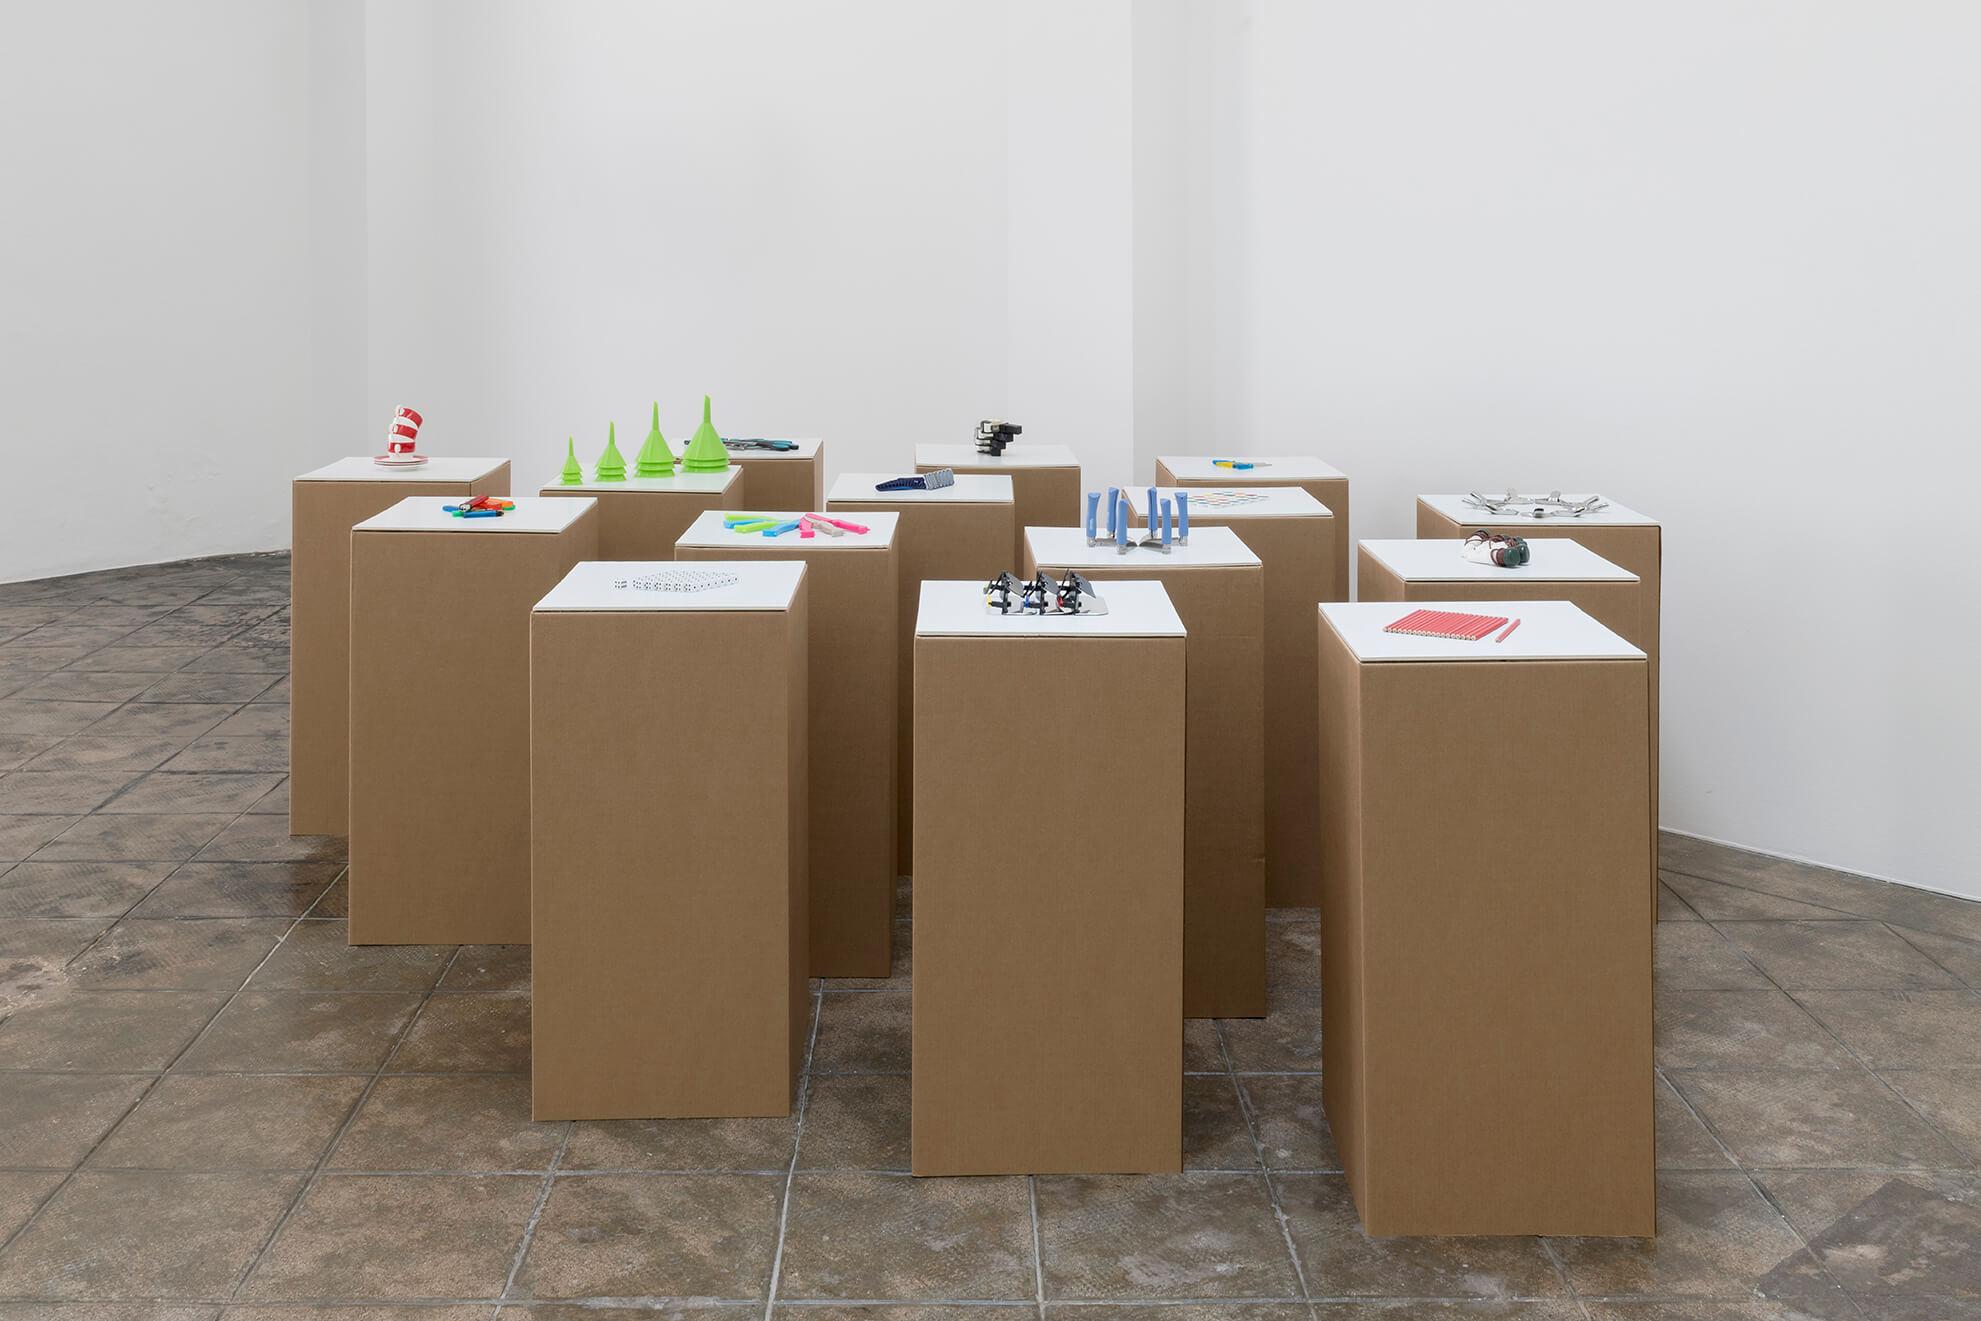 Aesthetic Studies, n.d. | Another Art Exhibition | ProjecteSD